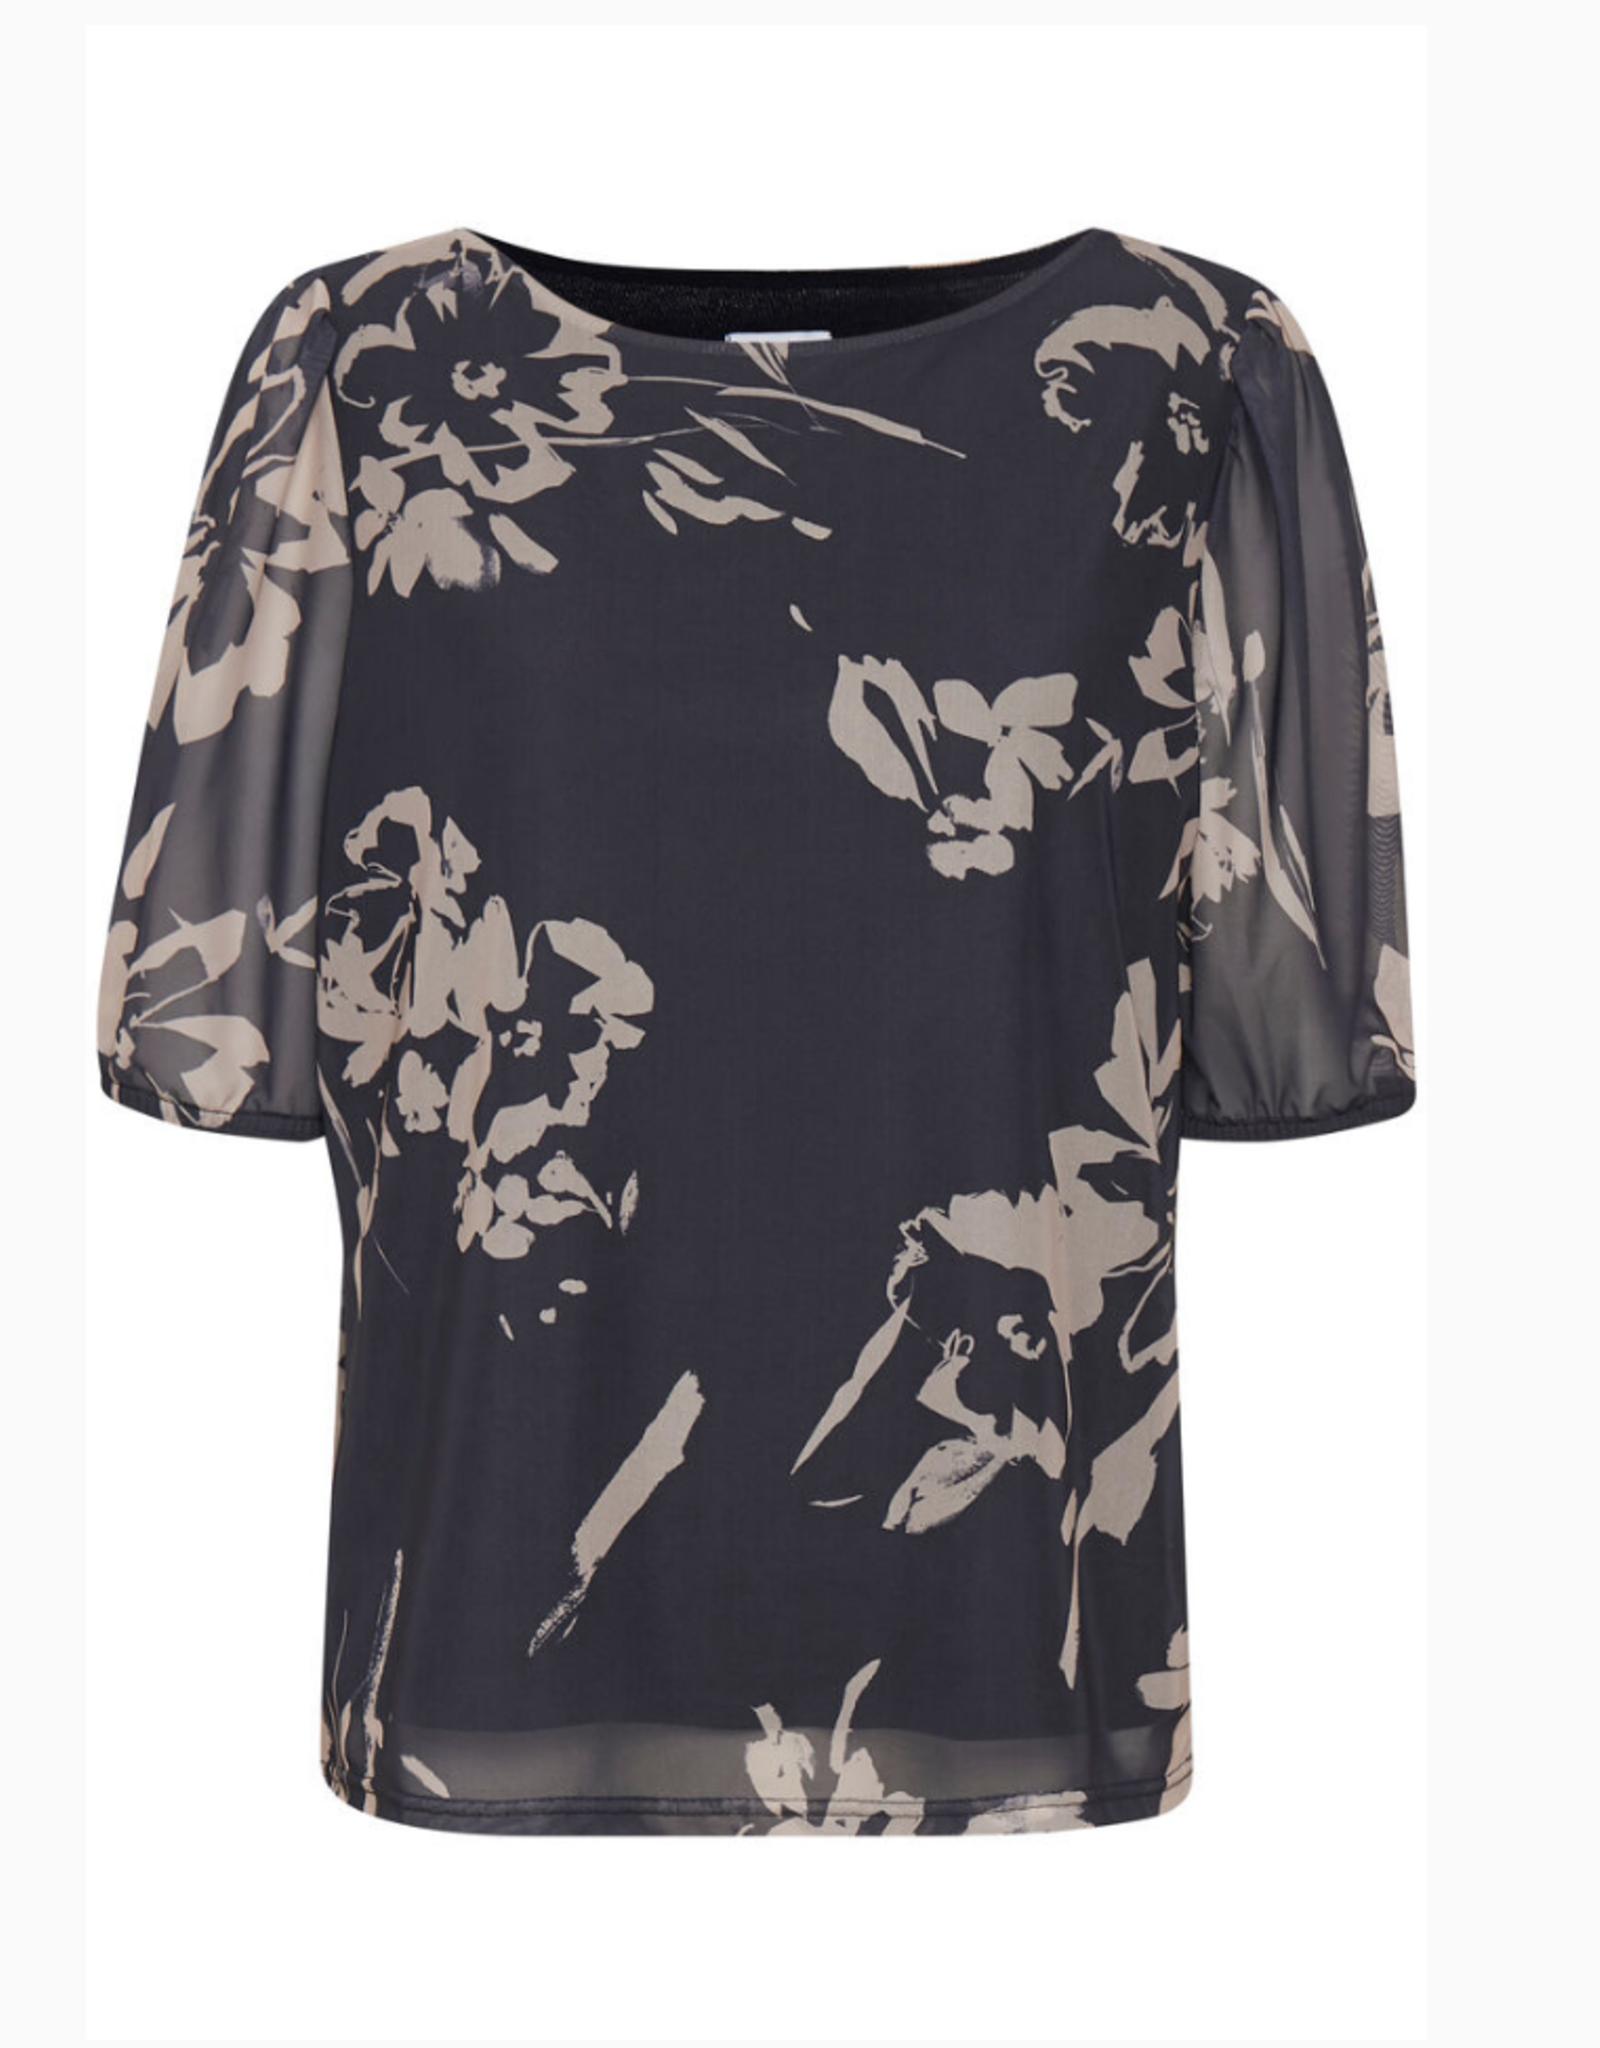 Saint-Tropez Saint-Tropez- Felicitysz blouse